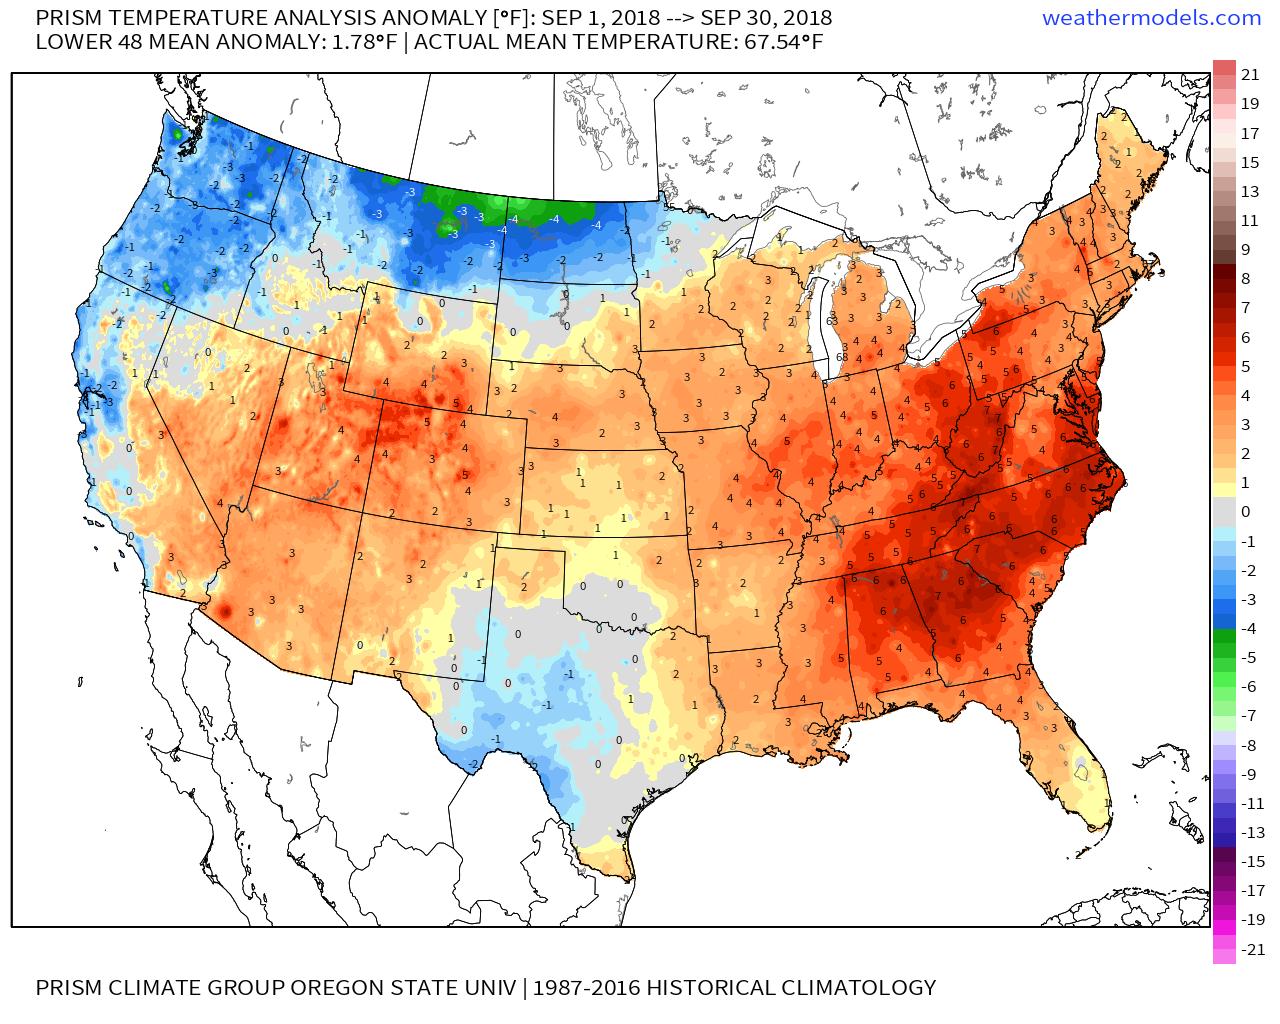 September 2018 Temperatures